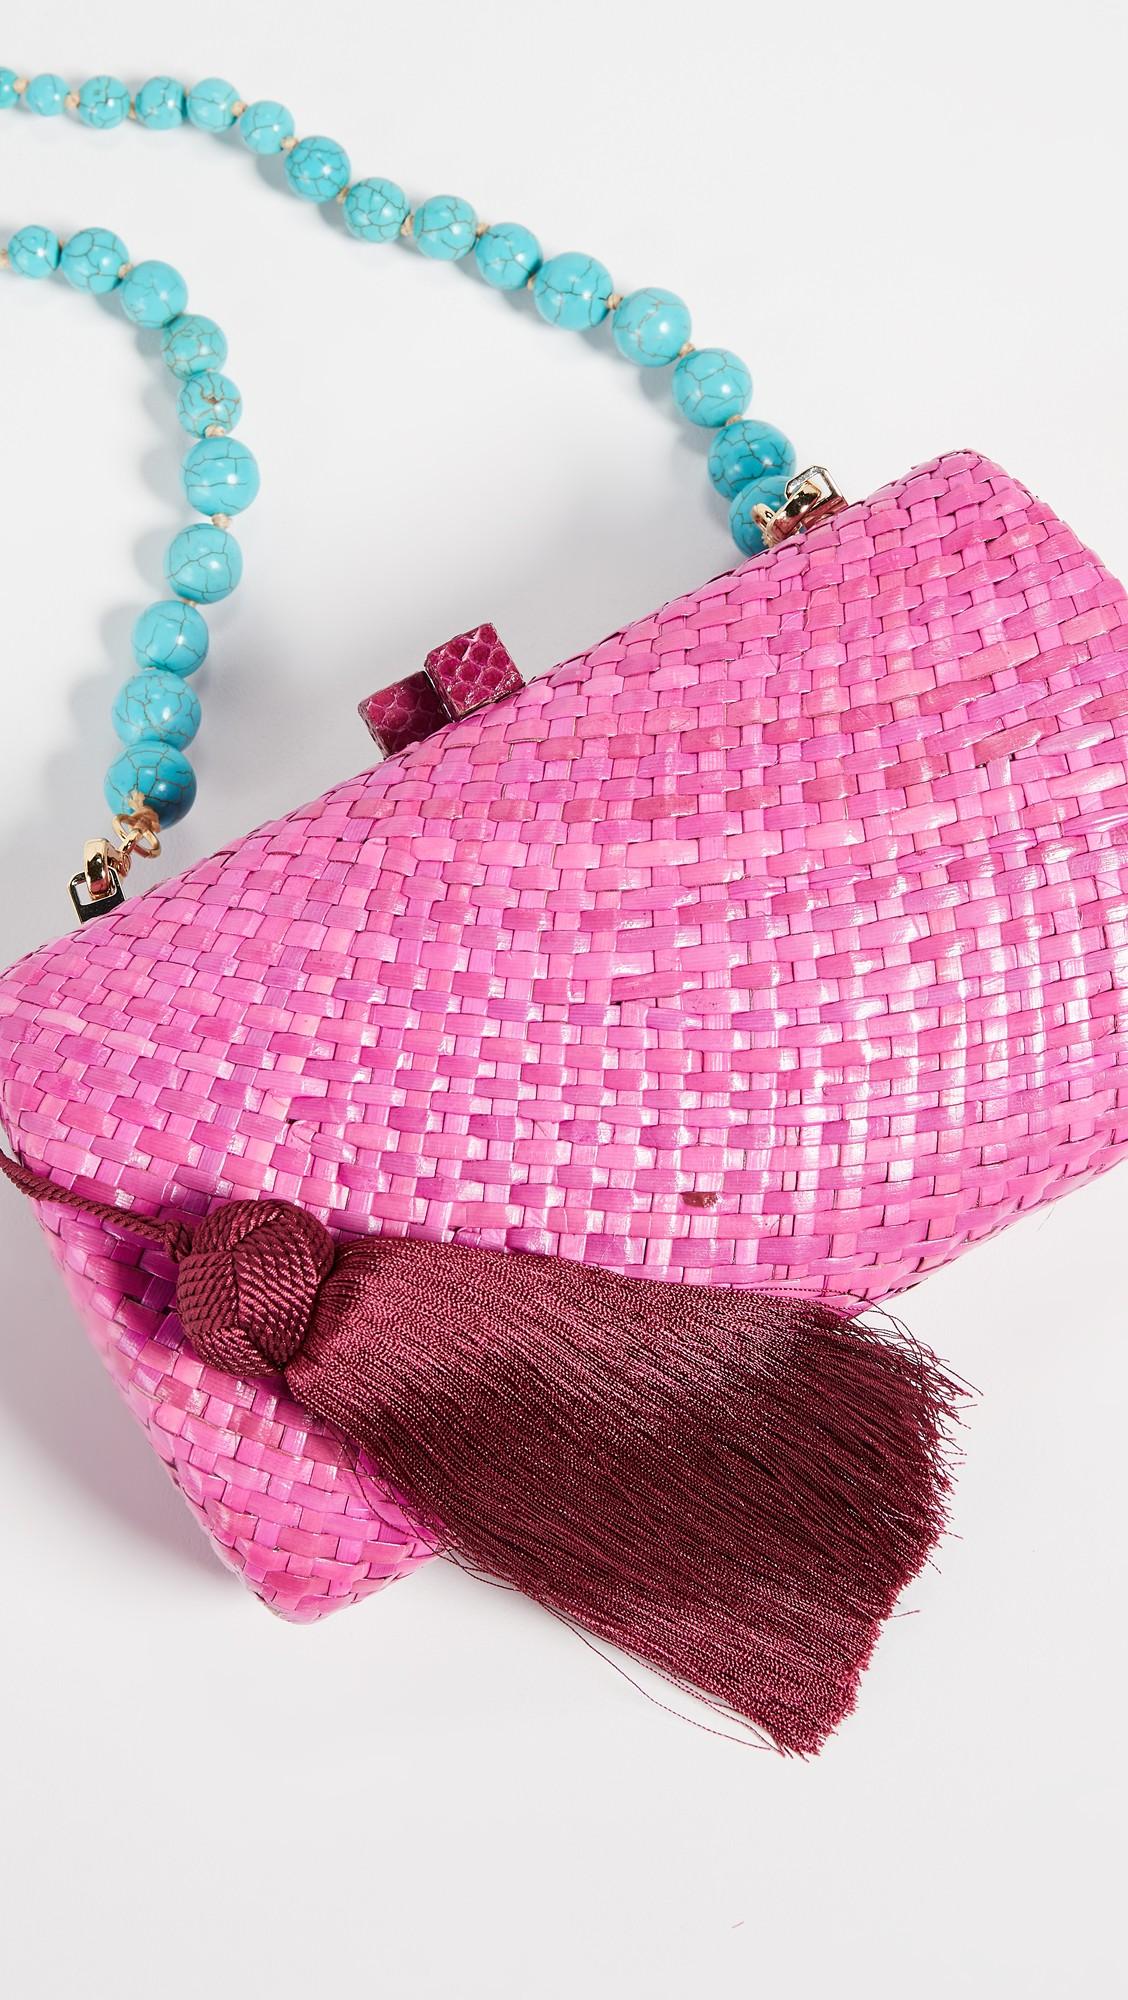 statement-handbags-2